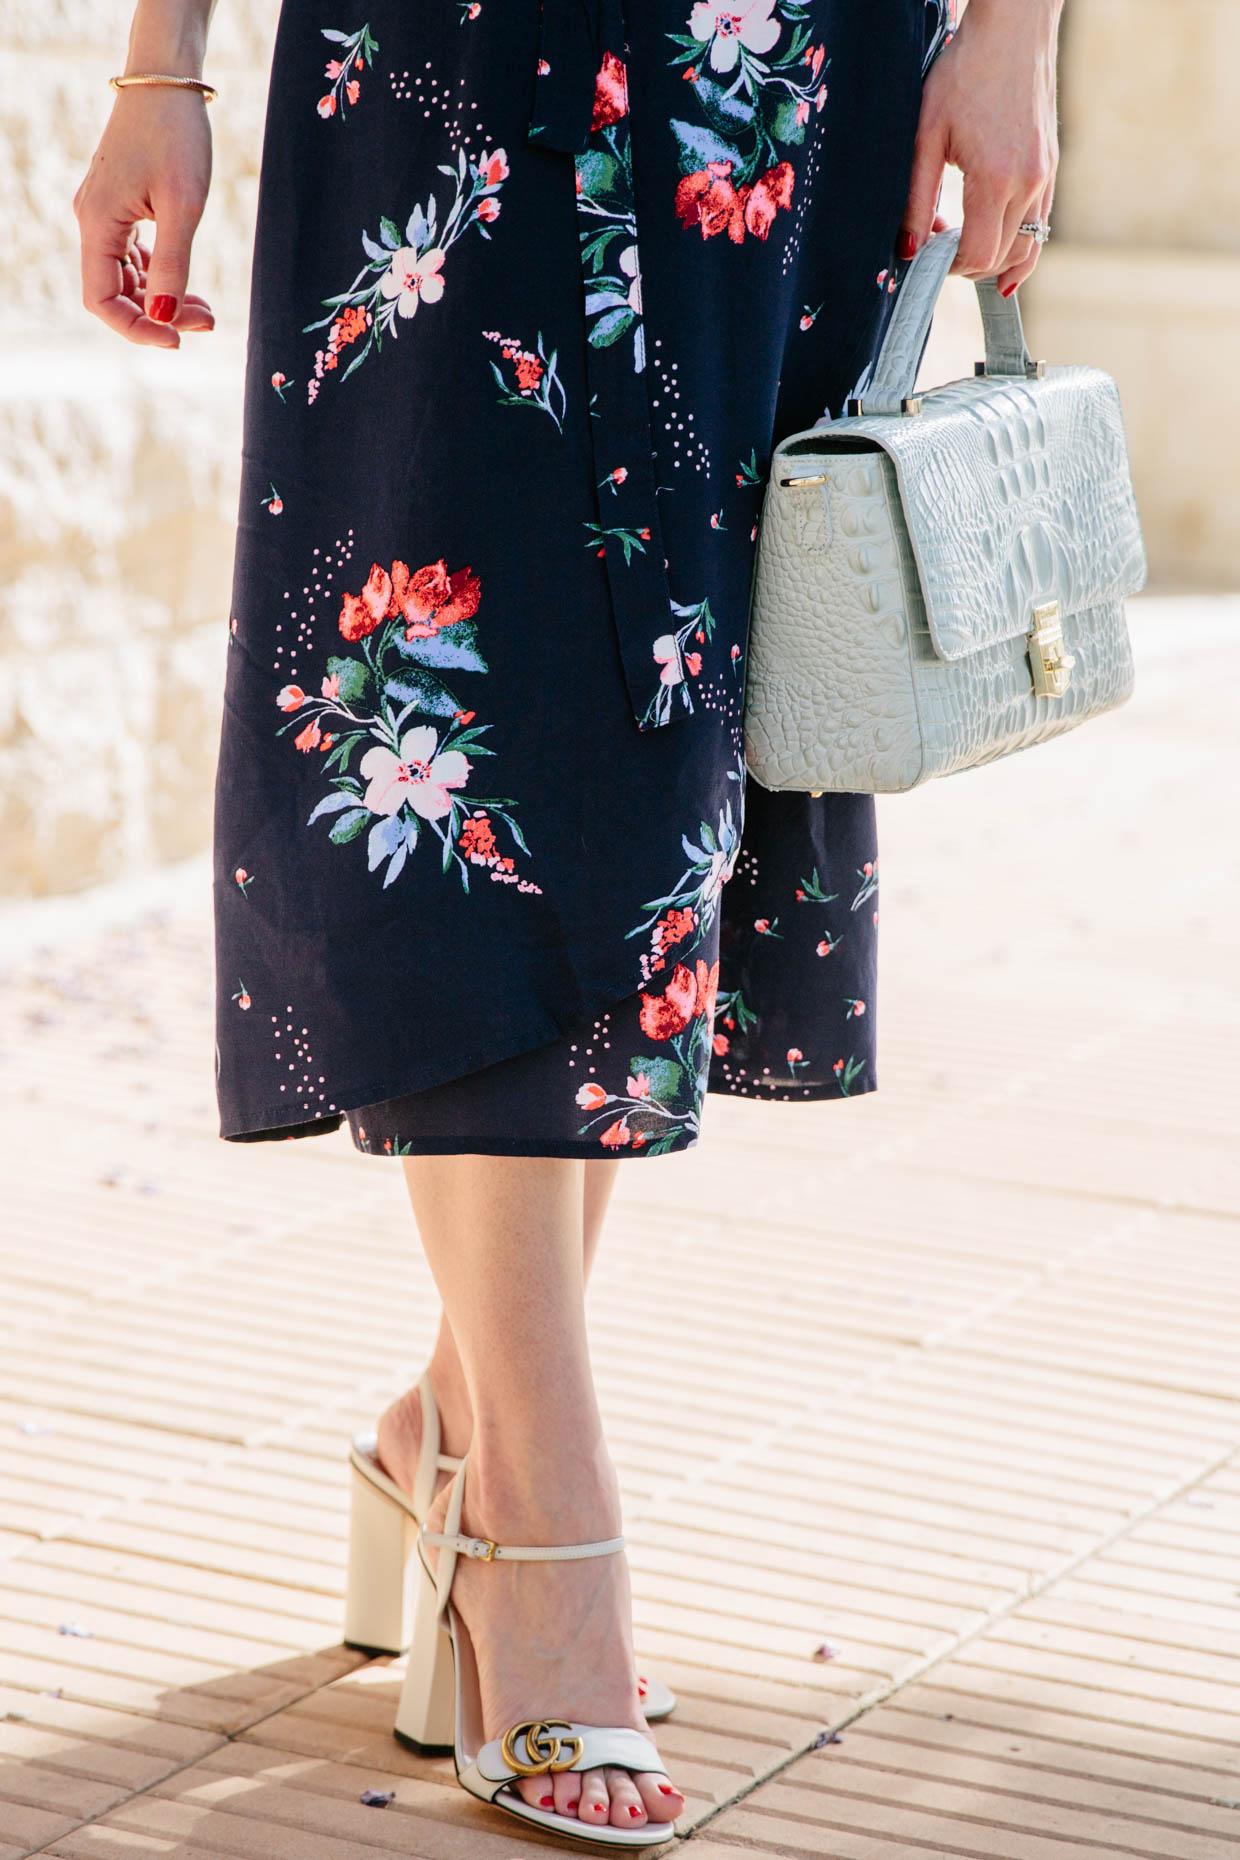 428b17d2ac5fb0 Gucci white block heel sandals outfit - Meagan s Moda